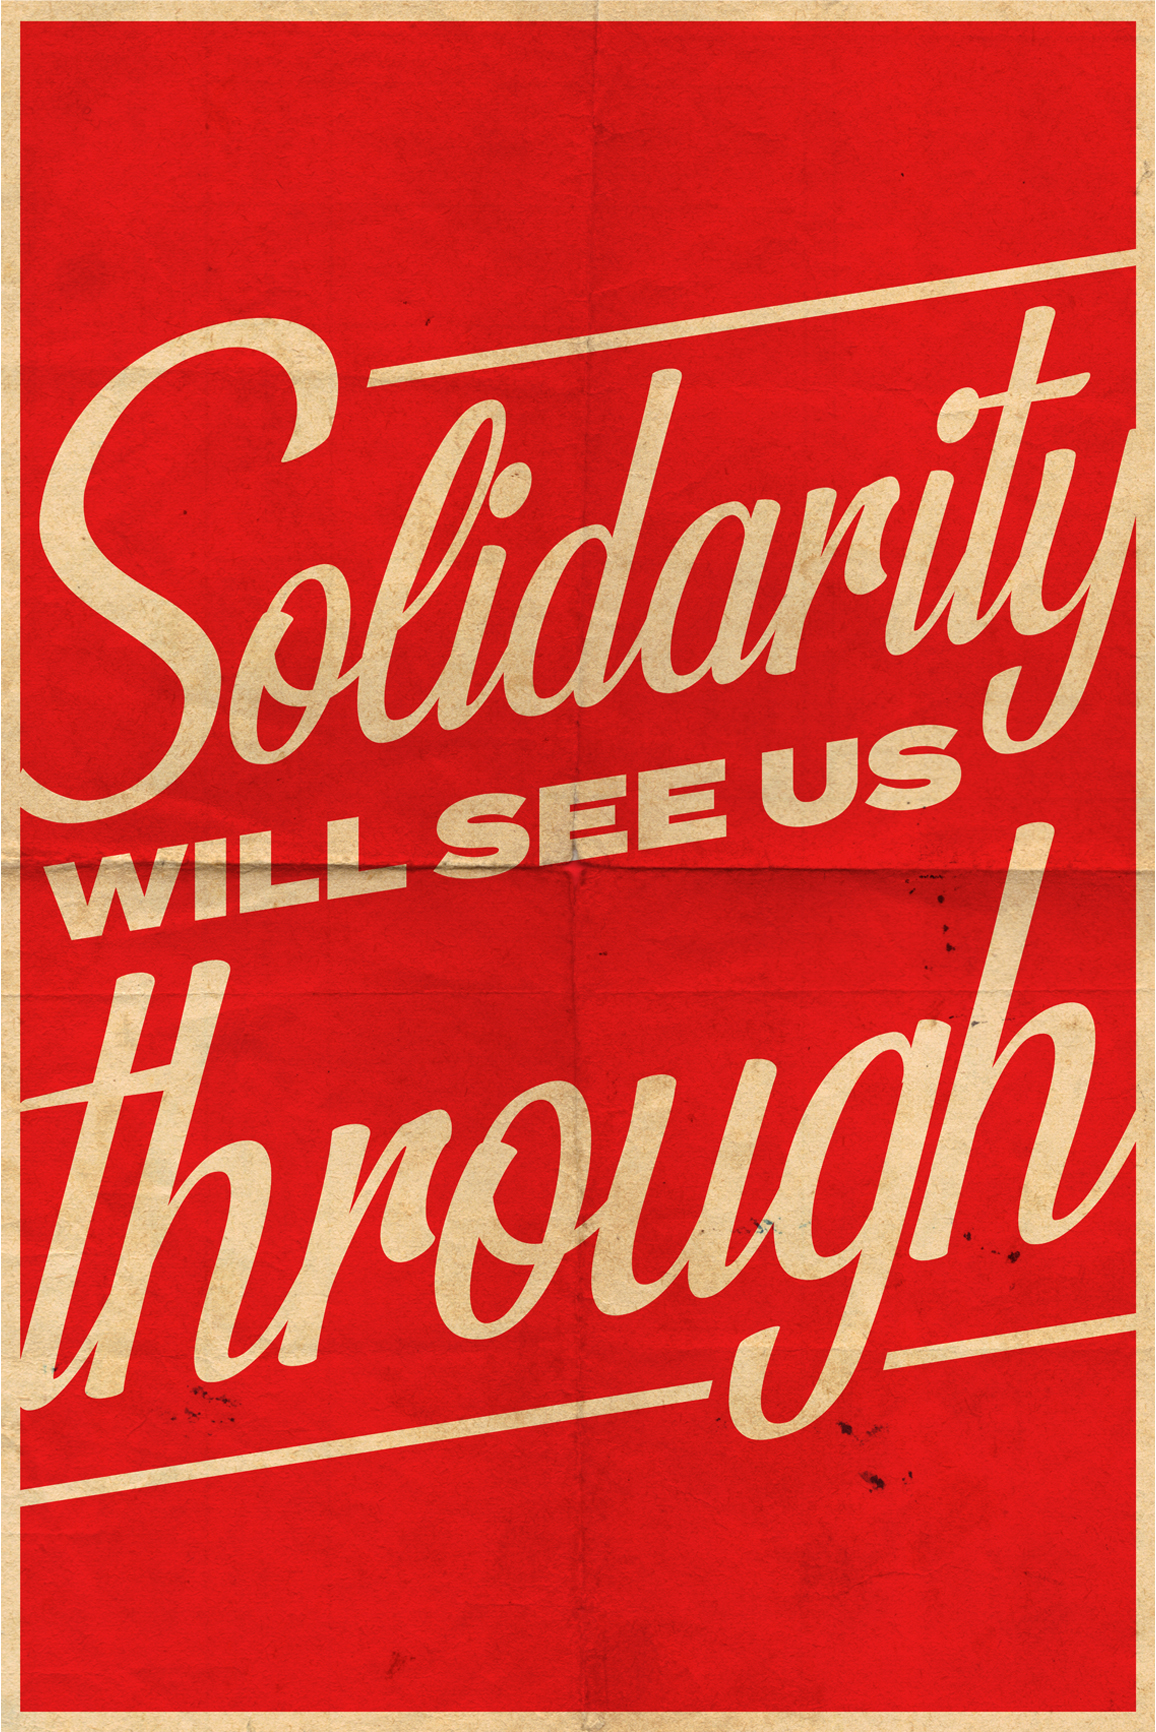 Power in Solidarity